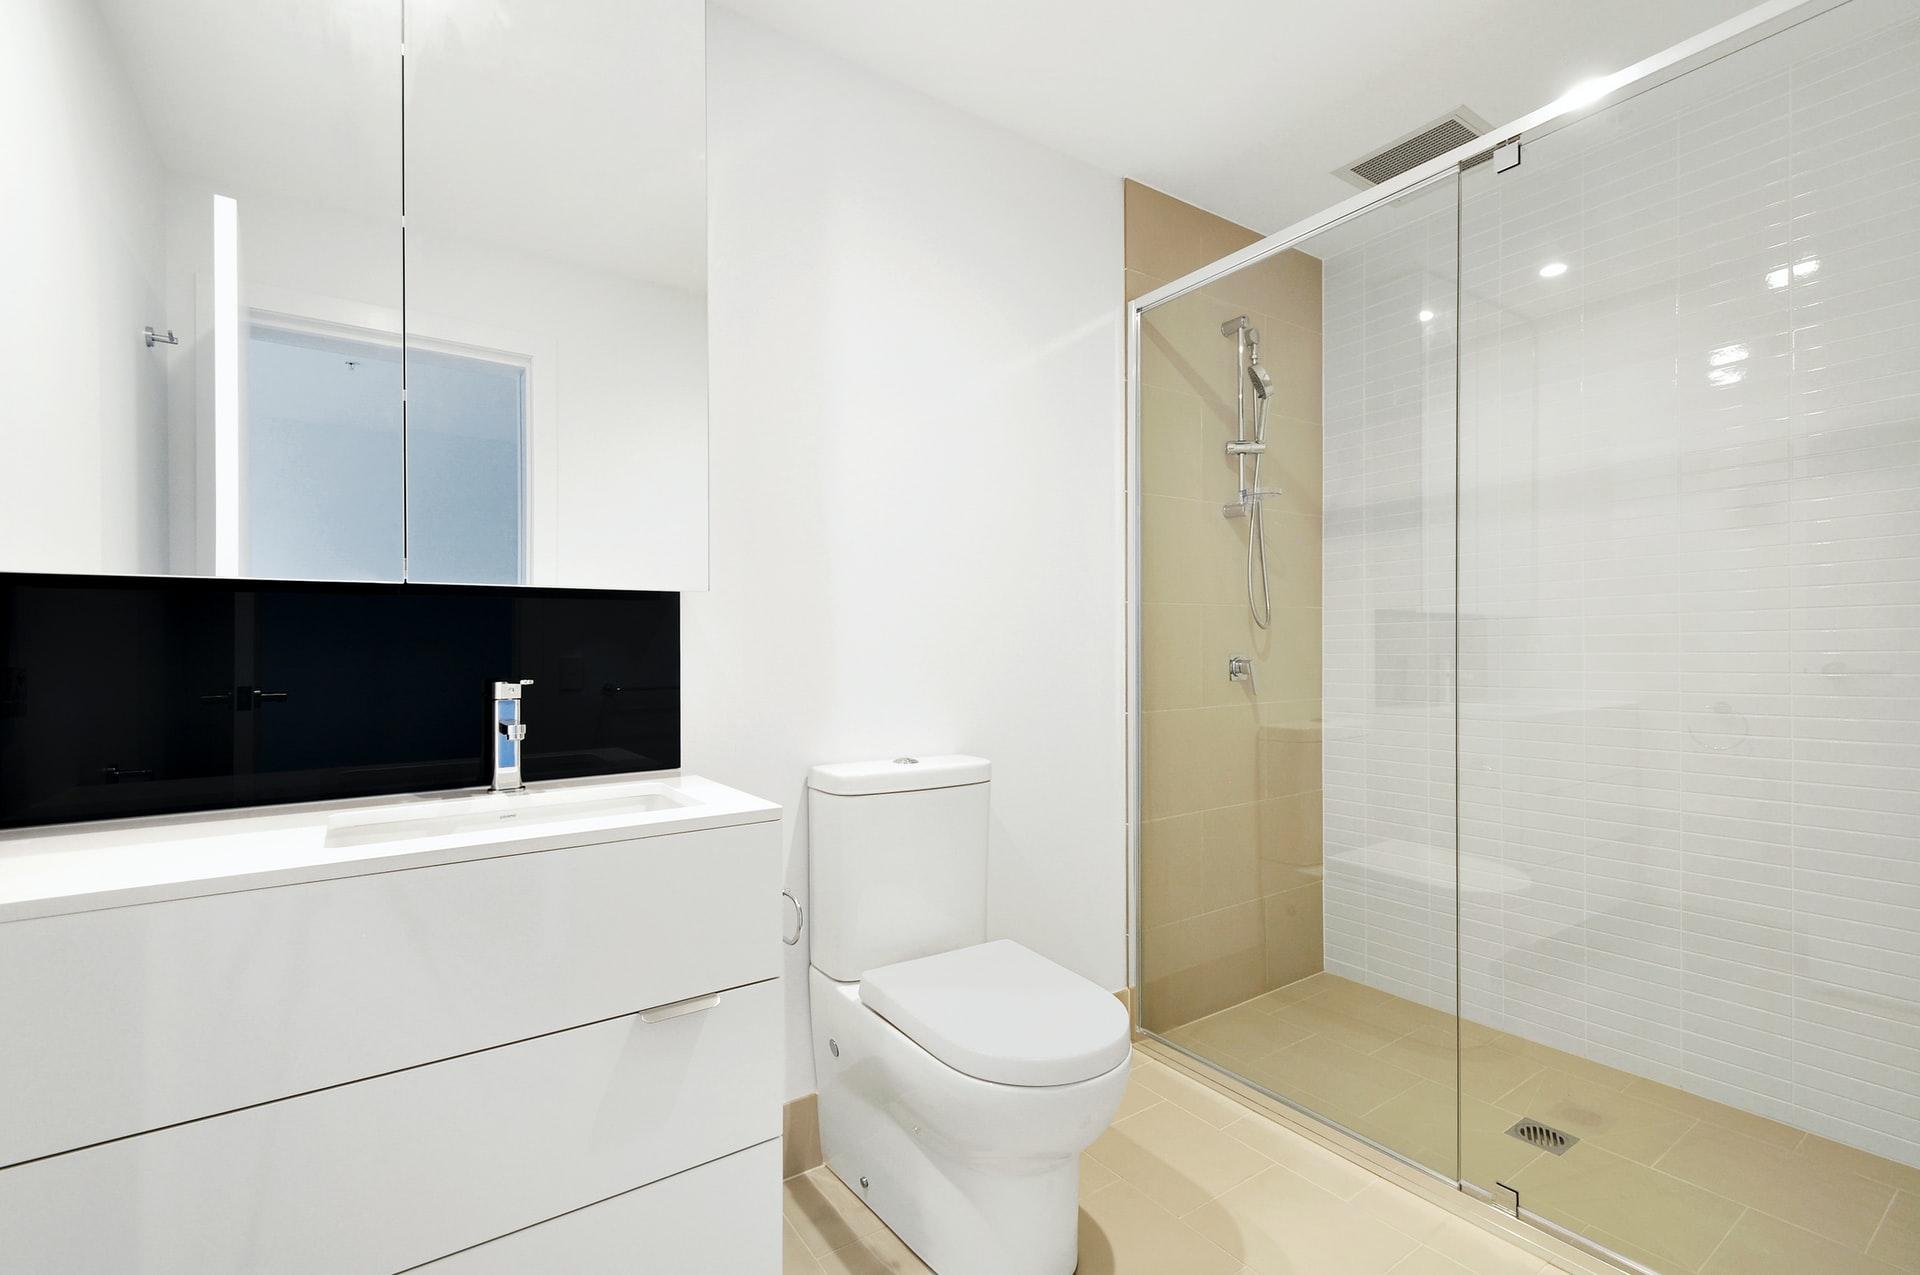 televisie in de badkamer